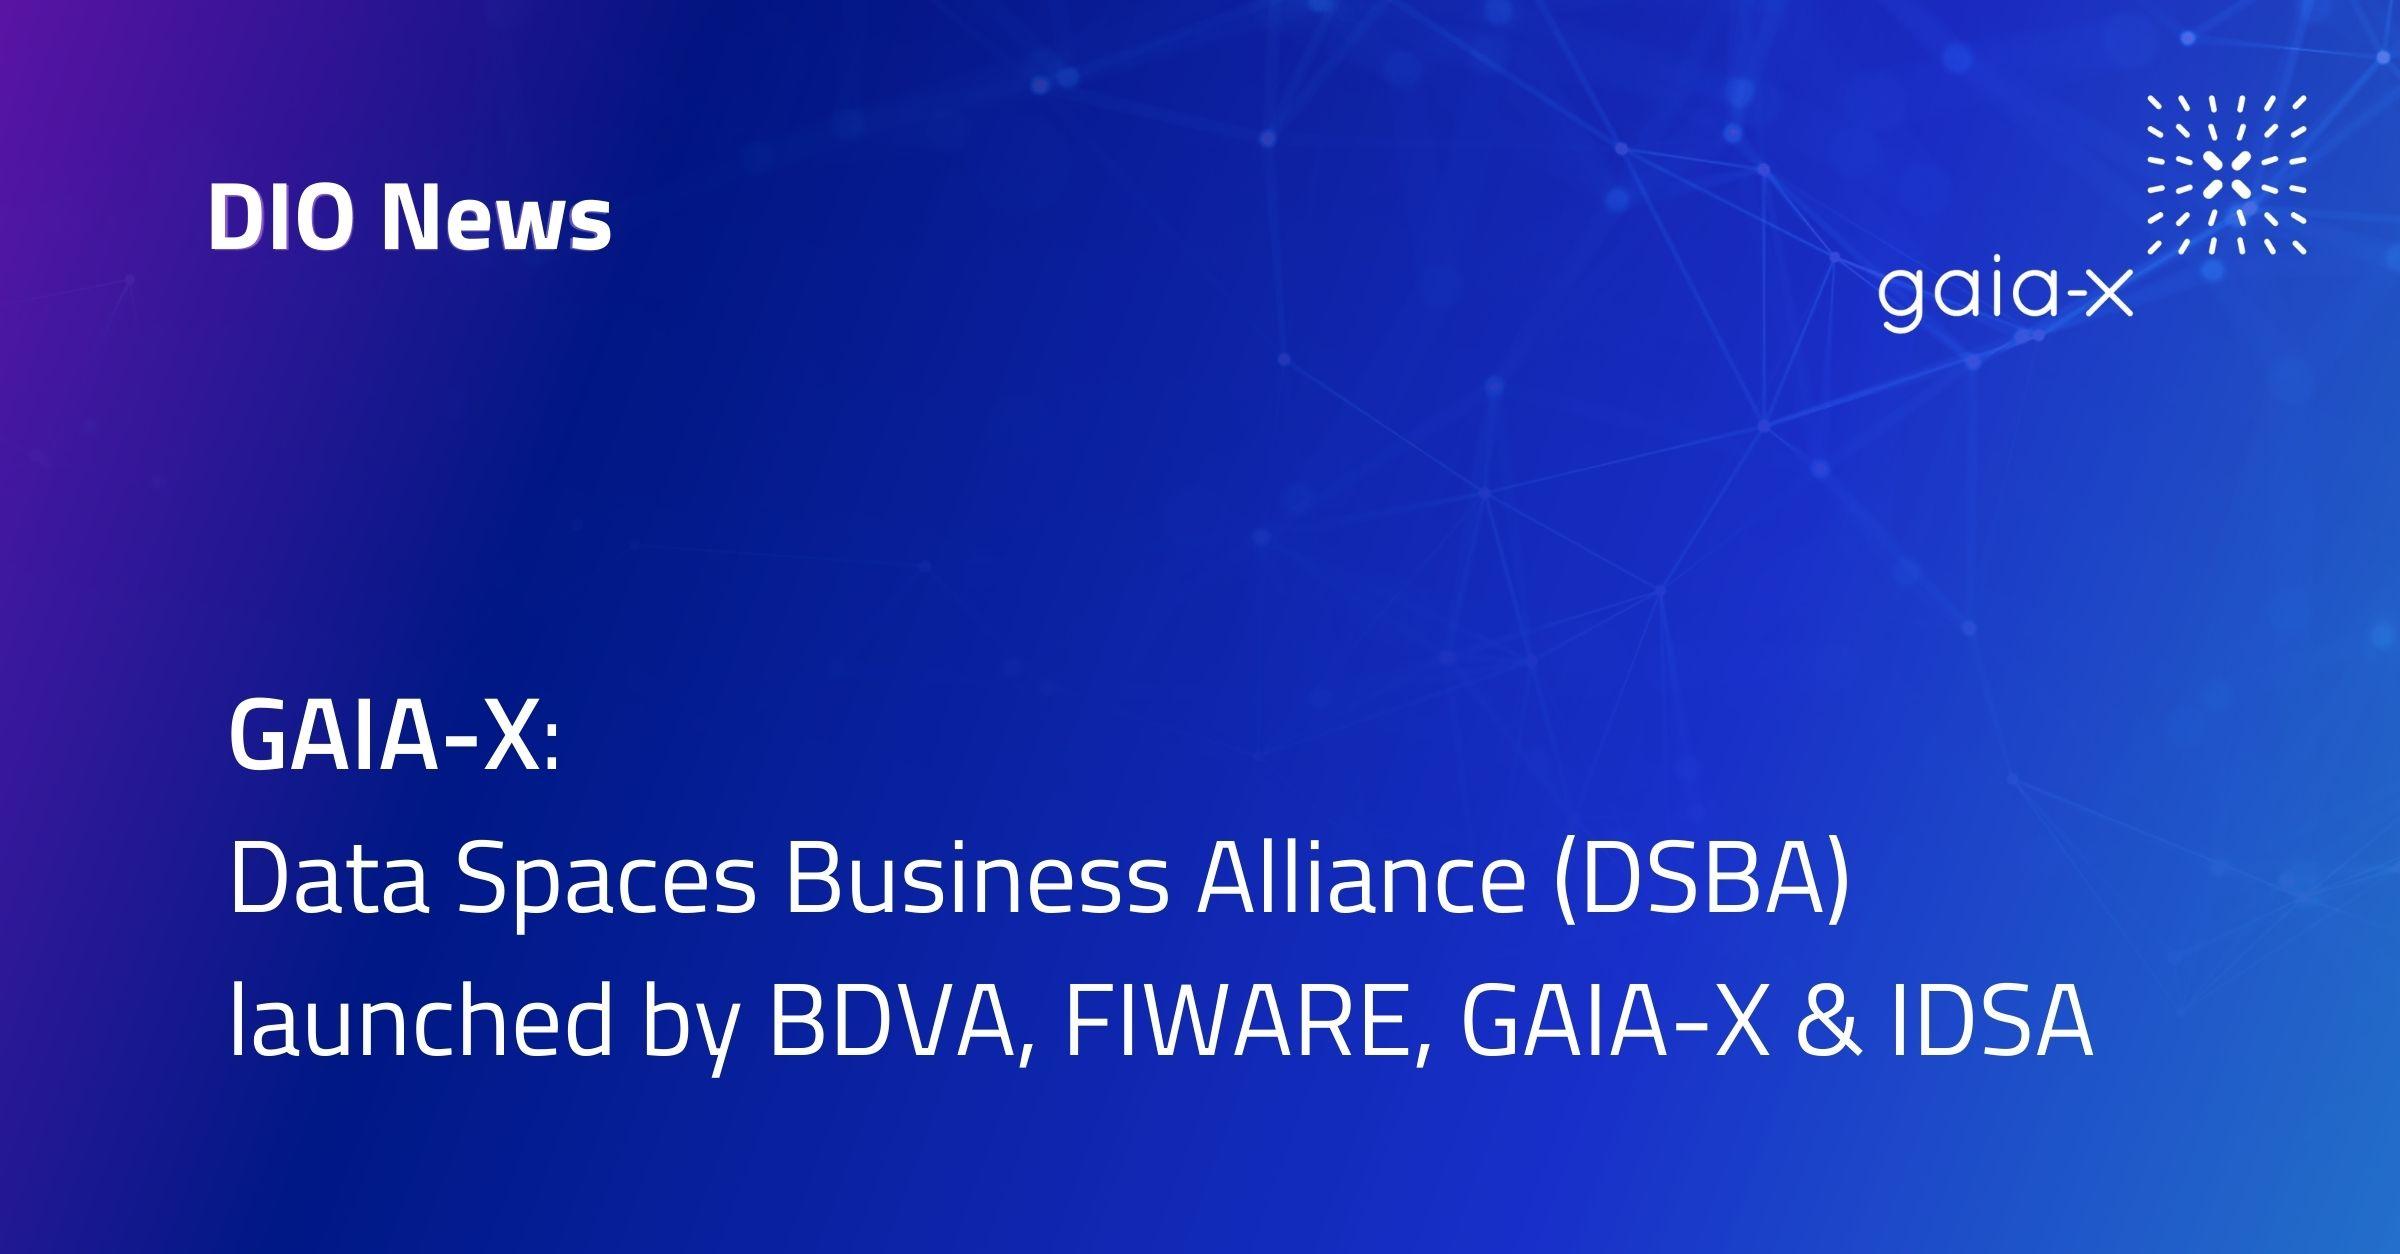 GAIA-X:  Data Spaces Business Alliance (DSBA) launched by BDVA, FIWARE, GAIA-X & IDSA